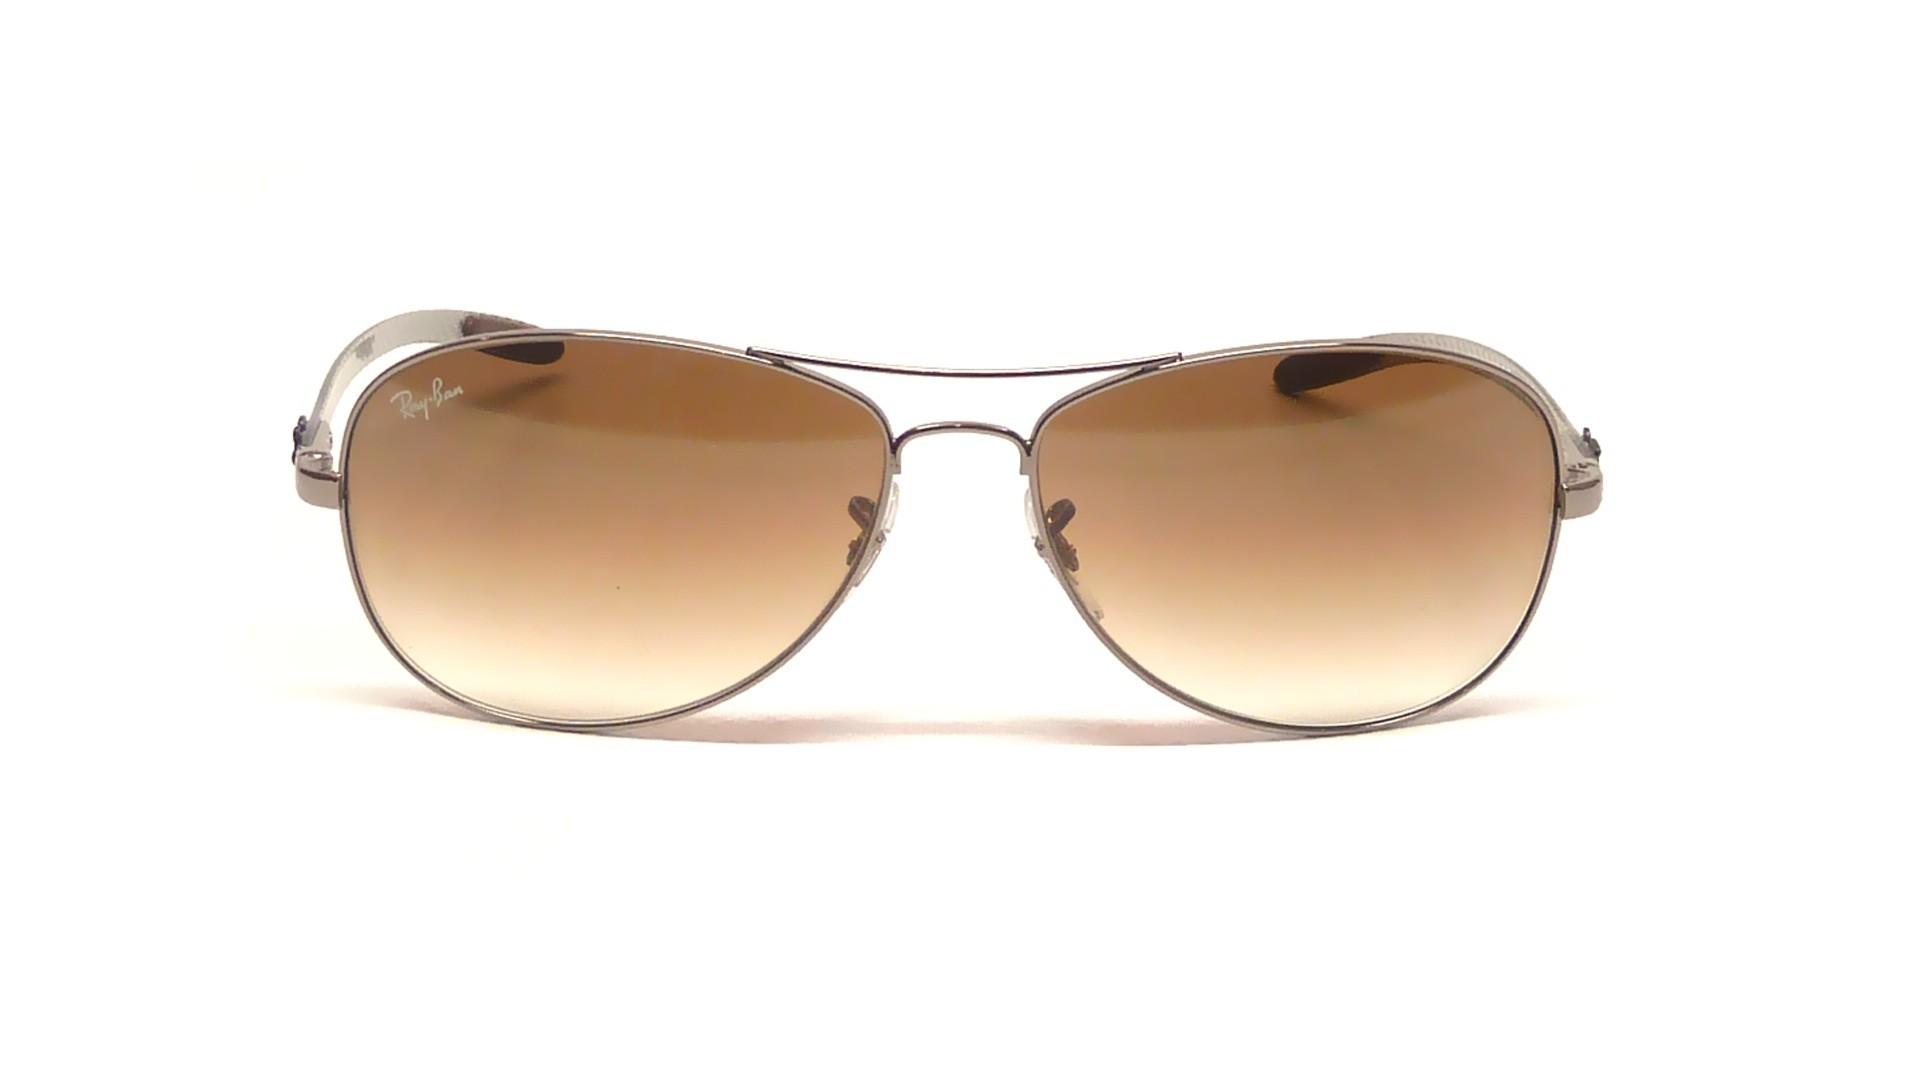 8aa608e461838 Ray Ban Sunglasses Rb8301 Price In India « Heritage Malta